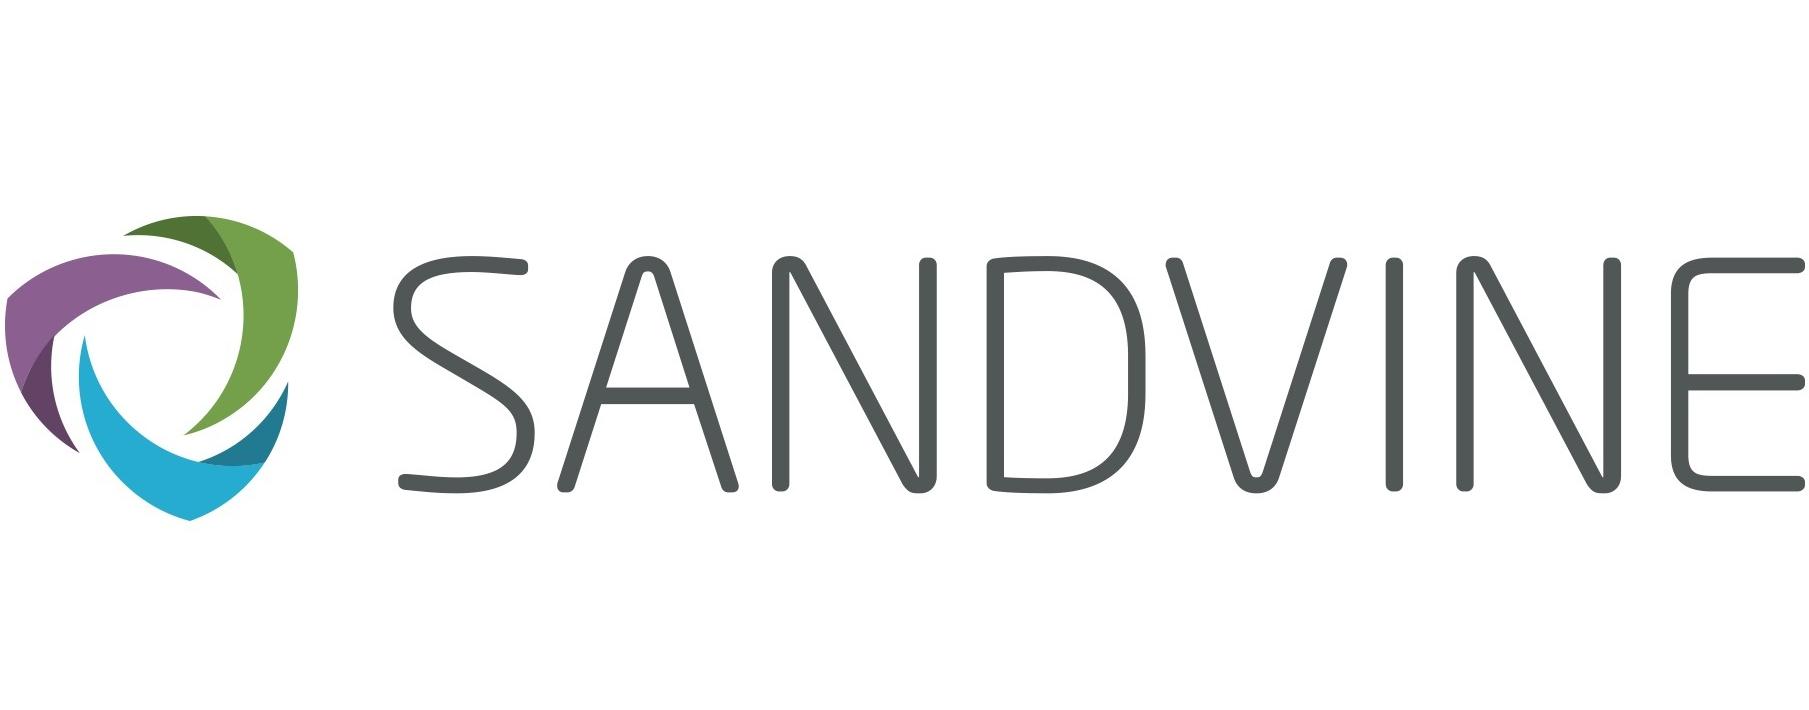 sandvine-logo-new copia